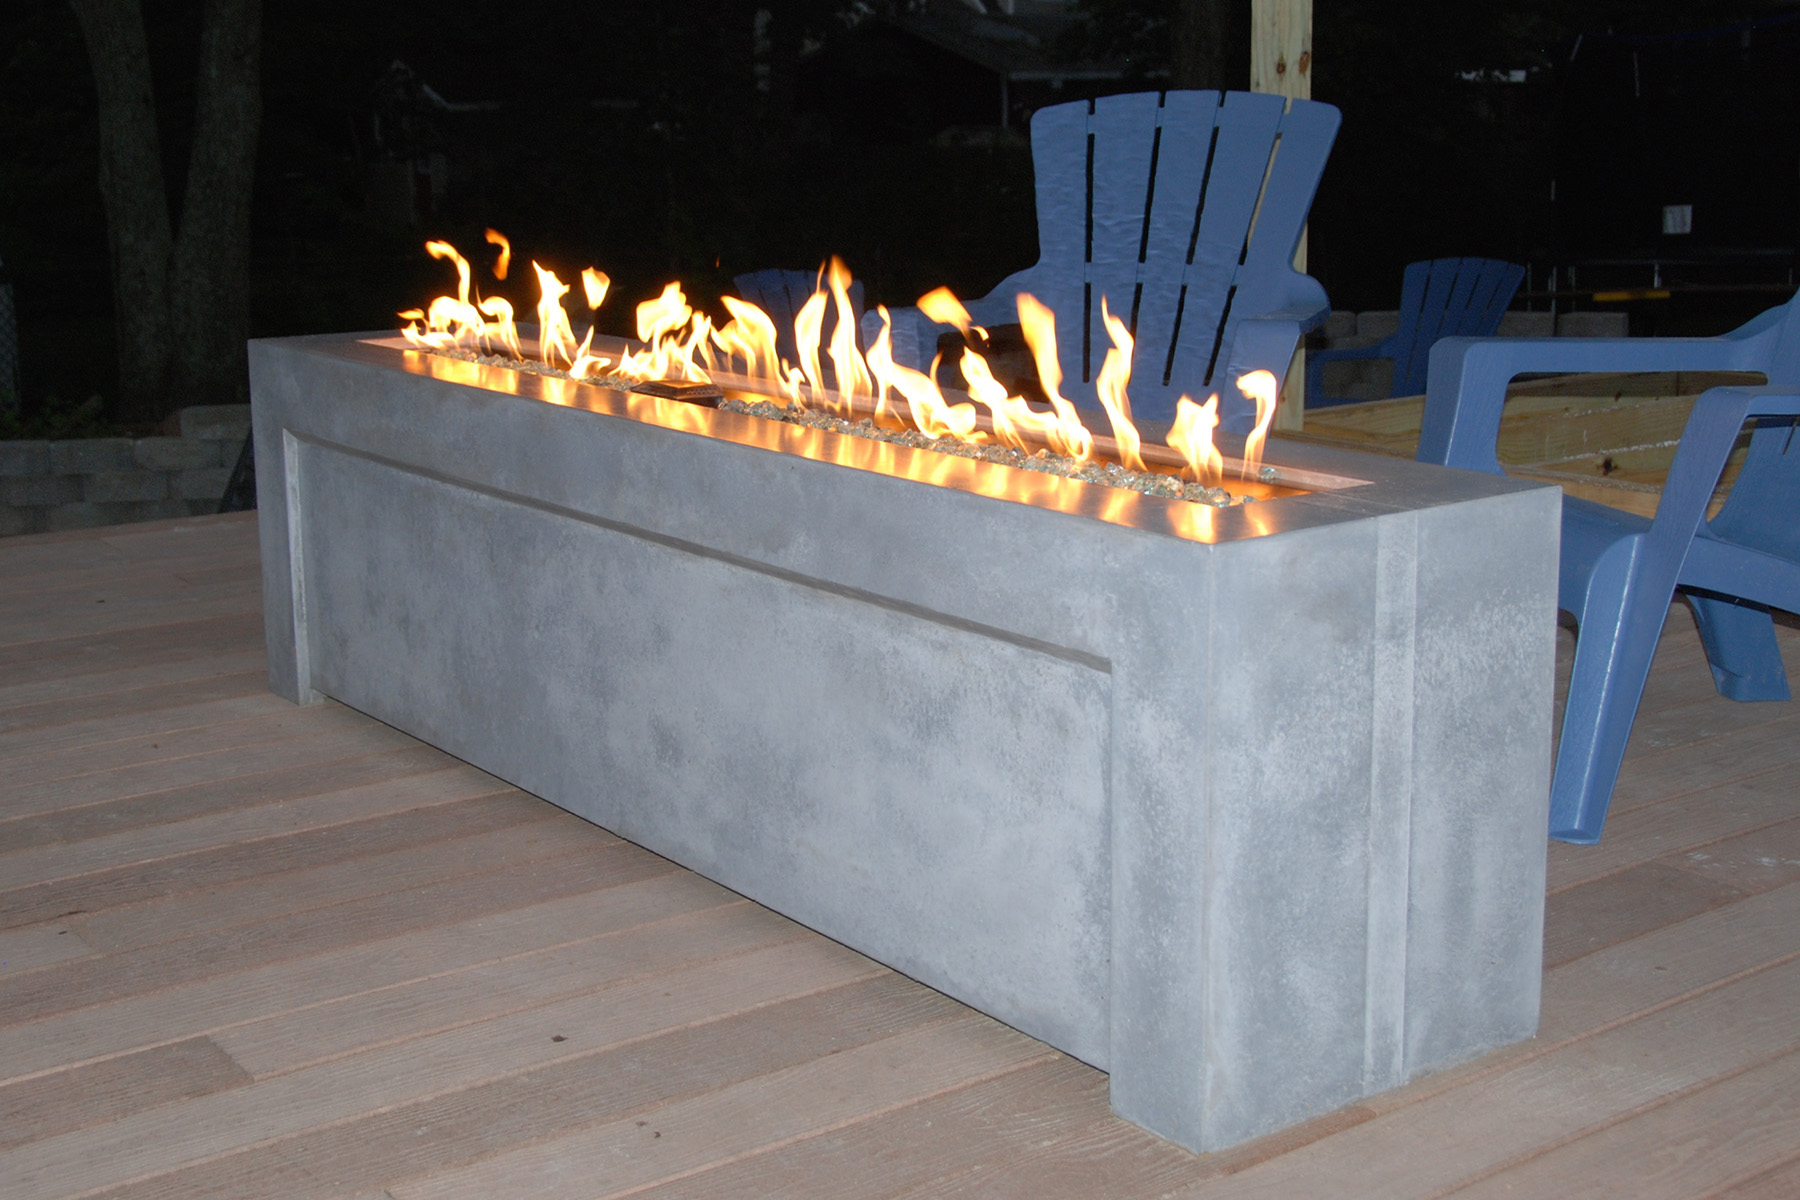 Precast Concrete Pits : Precast concrete fire pit fireplace design ideas